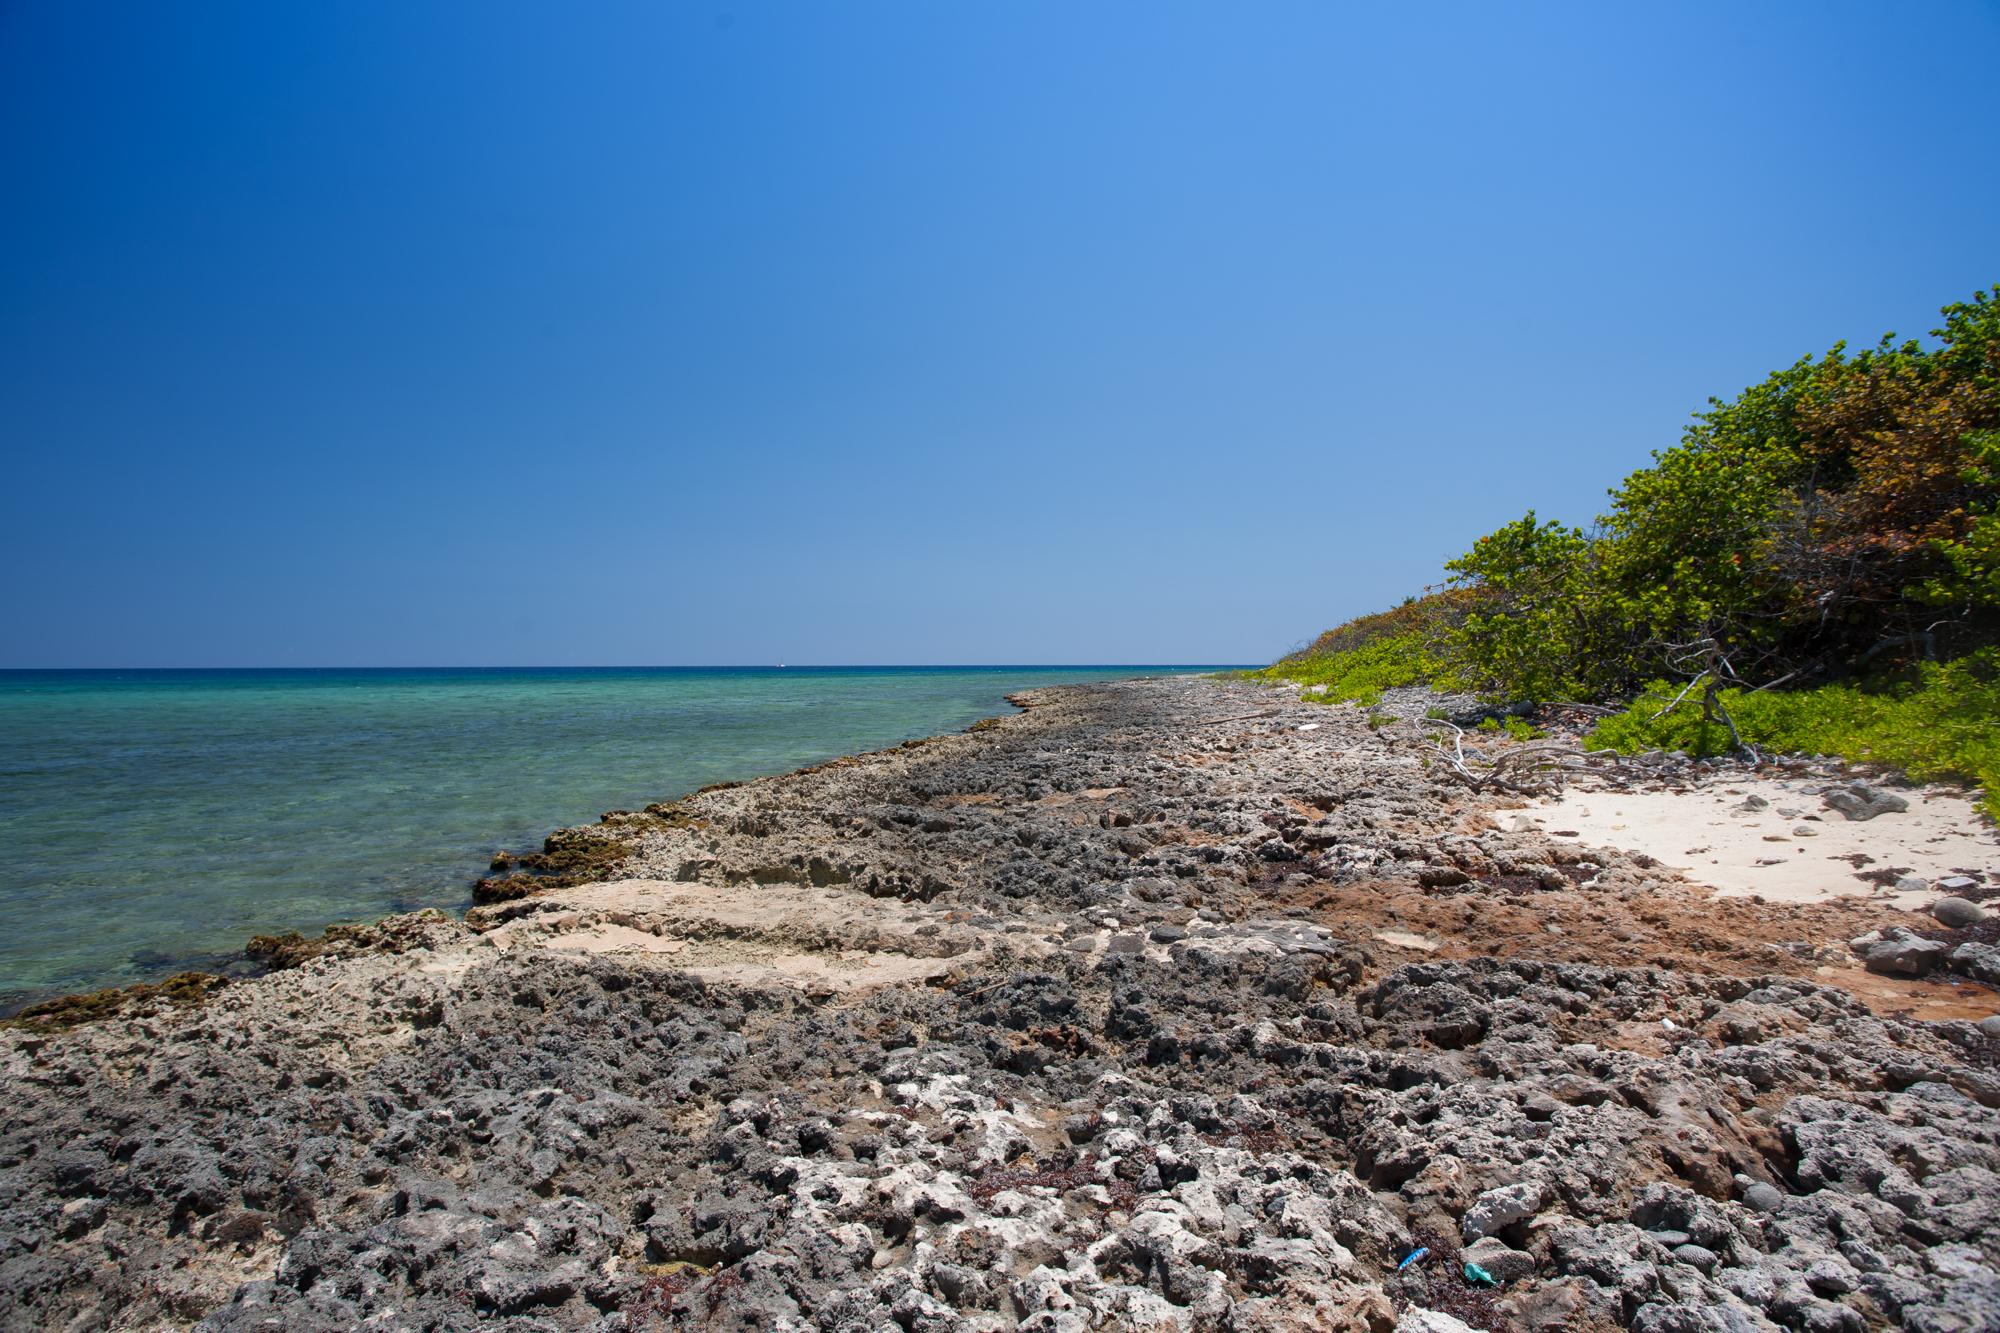 Property Of Ocean front land, Cayman Islands real estate